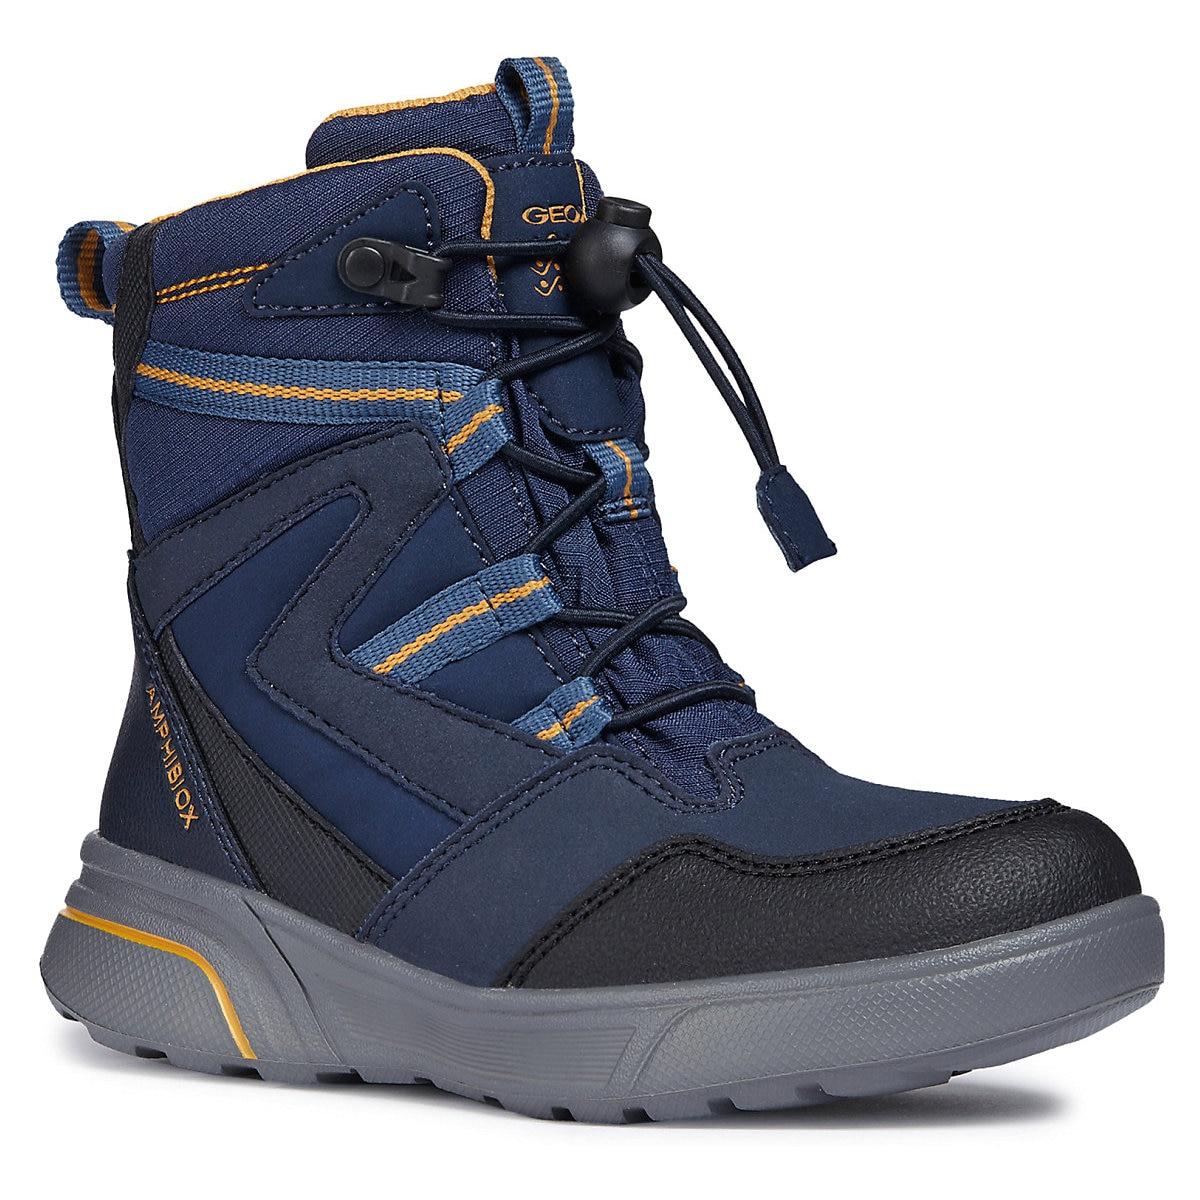 GEOX Boots 8786502 children shoes For boy Winter Boys faux fur MTpromo